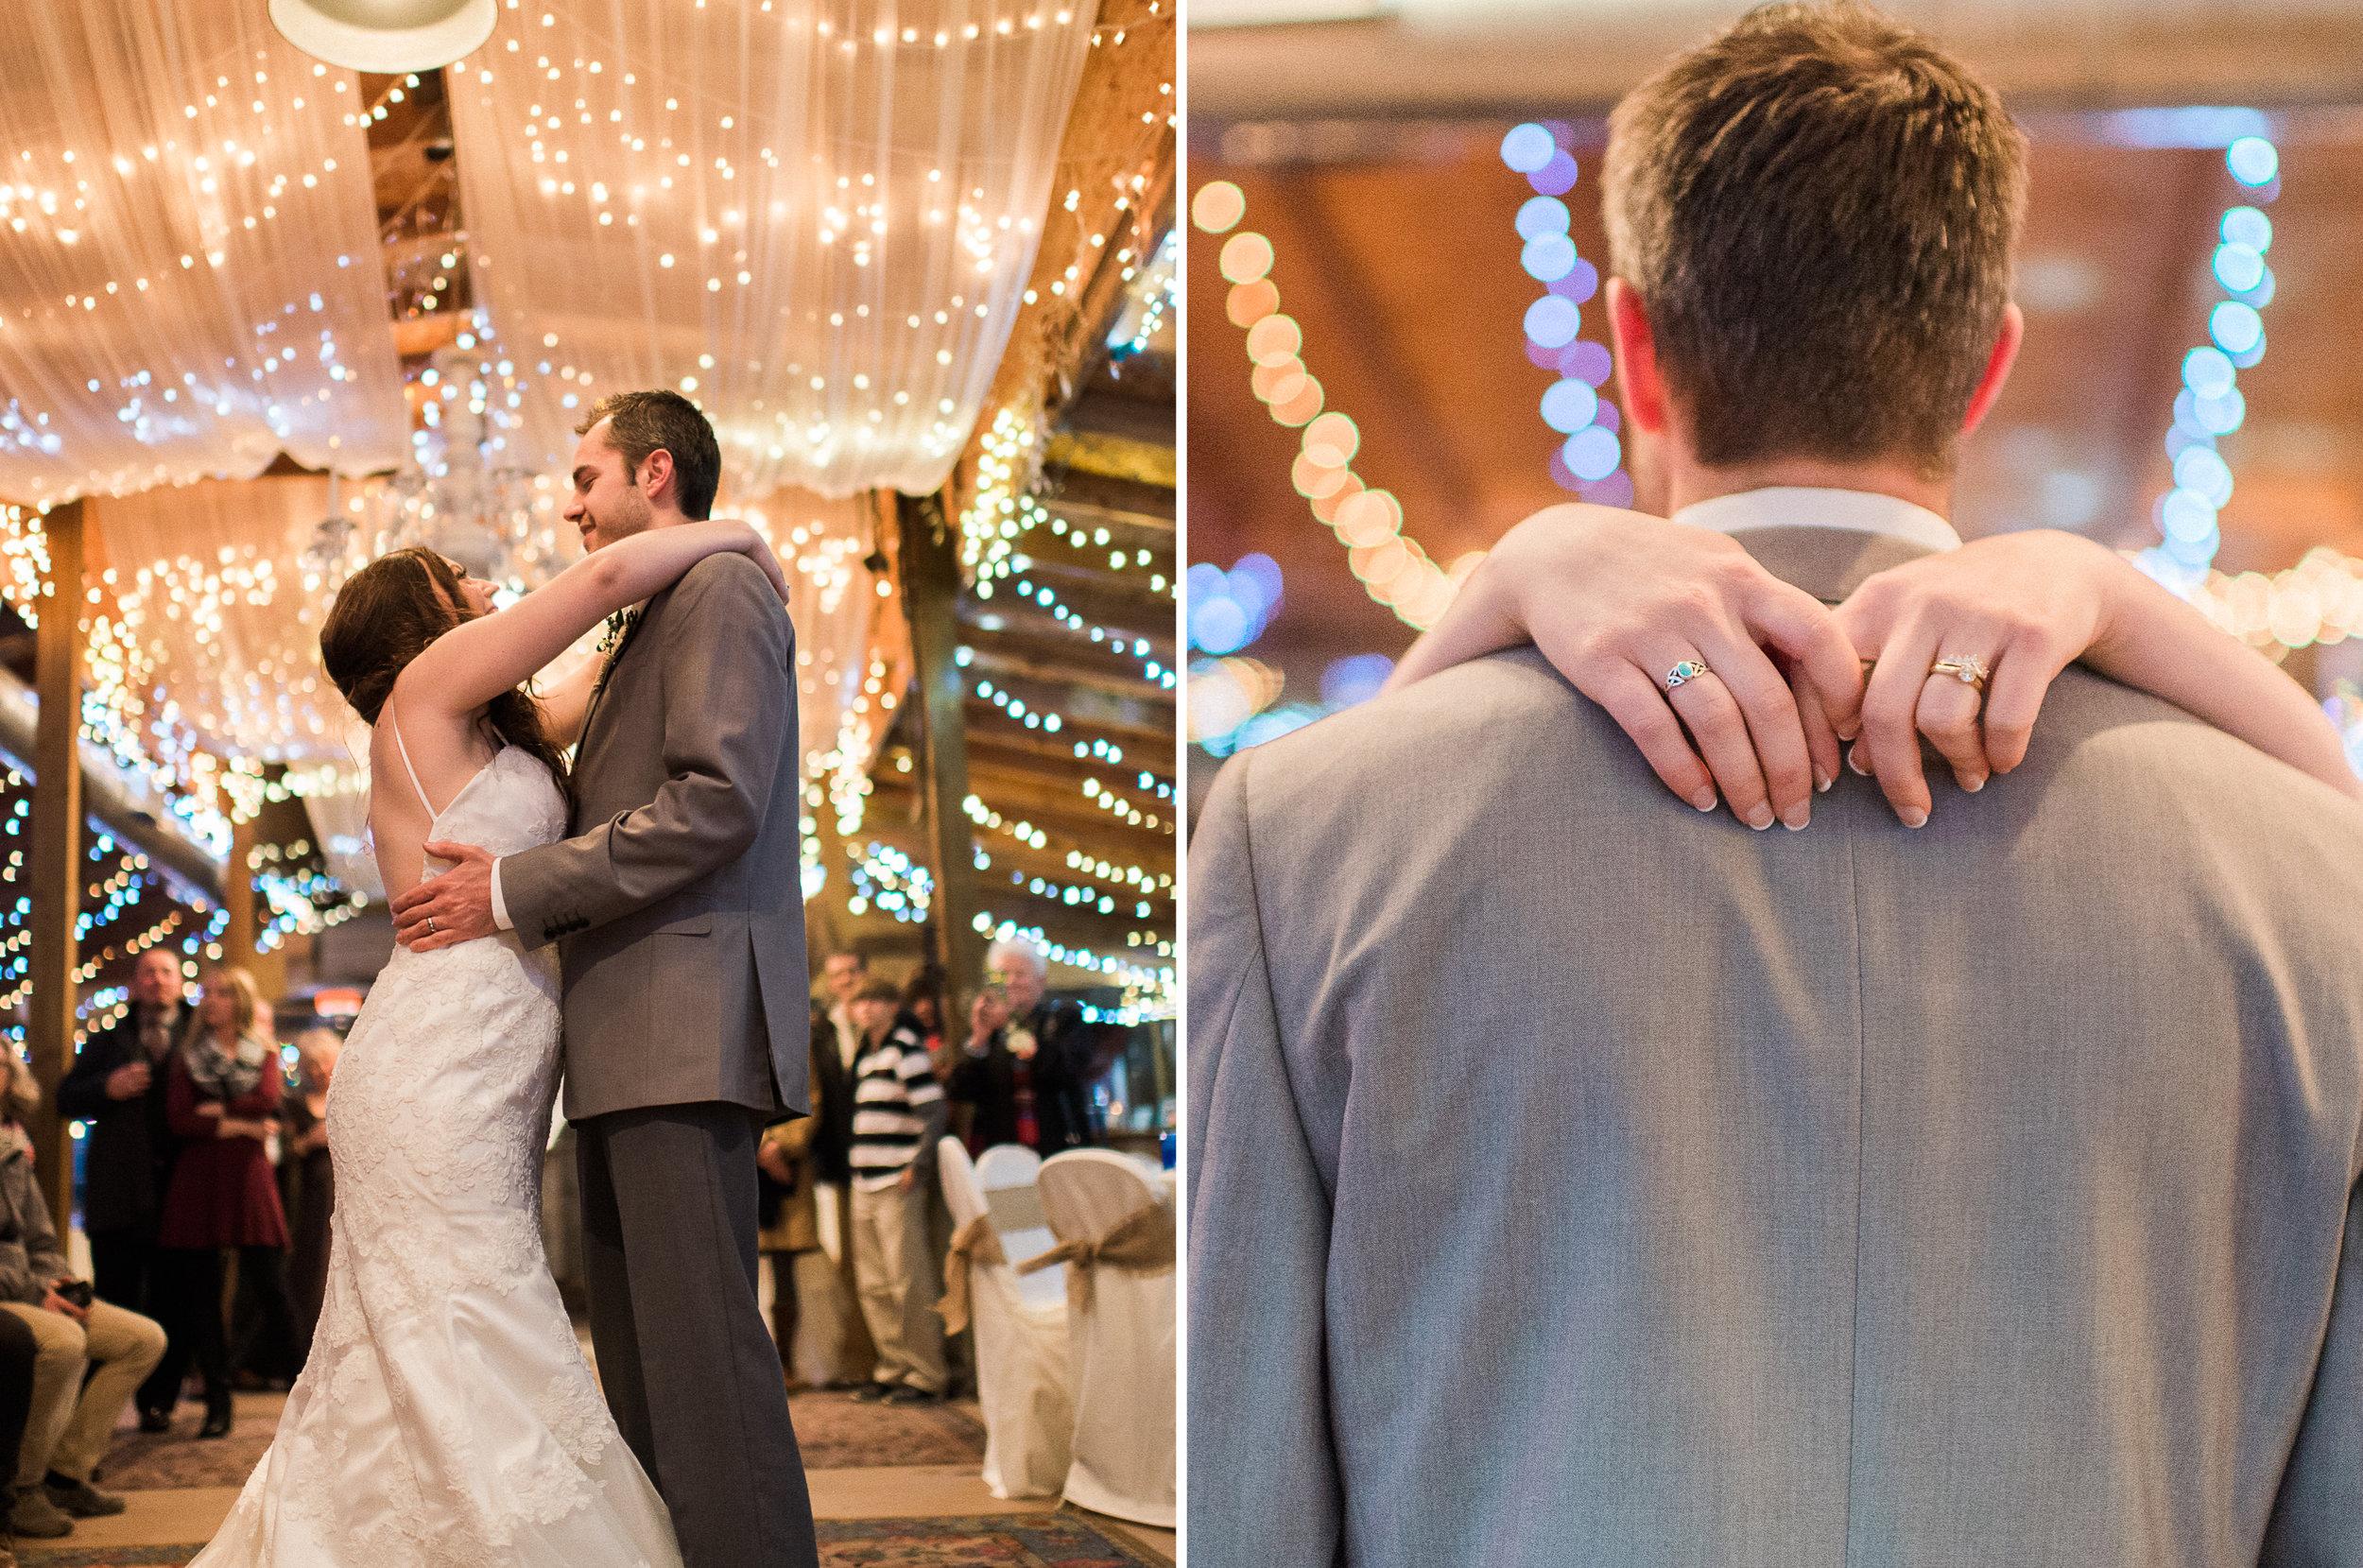 Ben+Joella | Jacob+Alana Wedding39.jpg